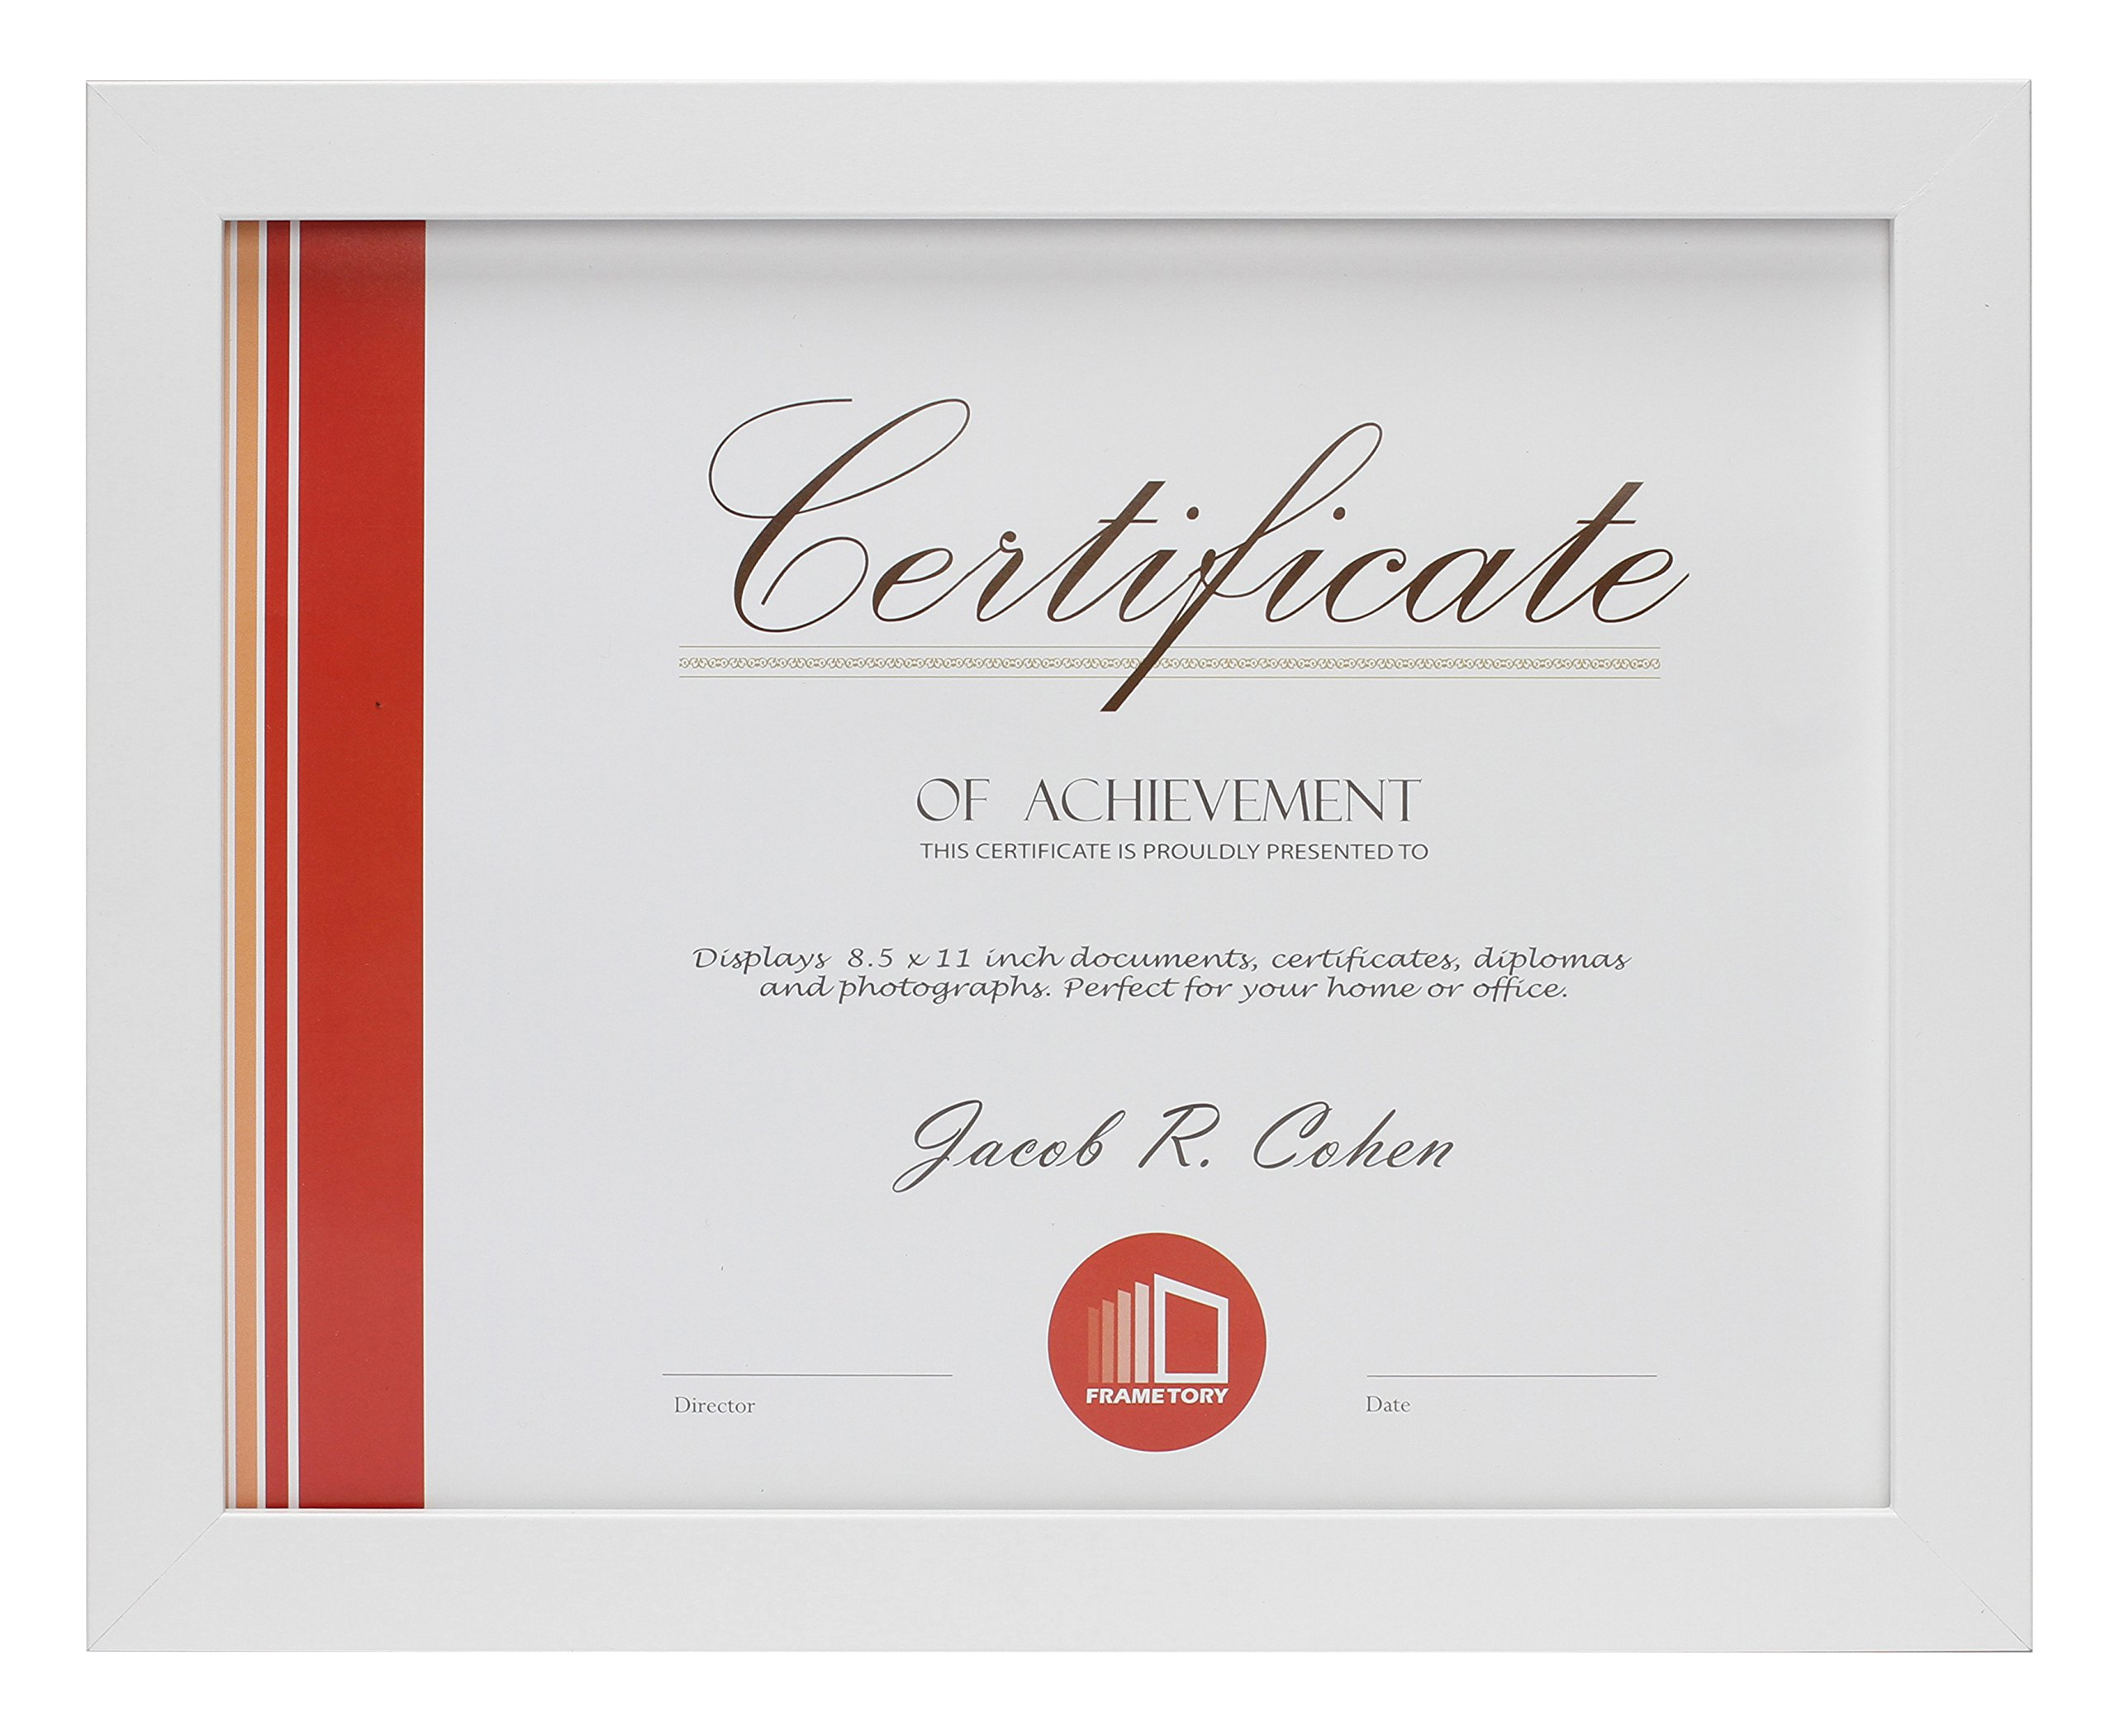 Frametory, Document Frame - Made to Display Certificates 8.5x11 Inch - Document Frames, Certificate Frames, Standard Paper Frame (8.5x11, White) by Frametory